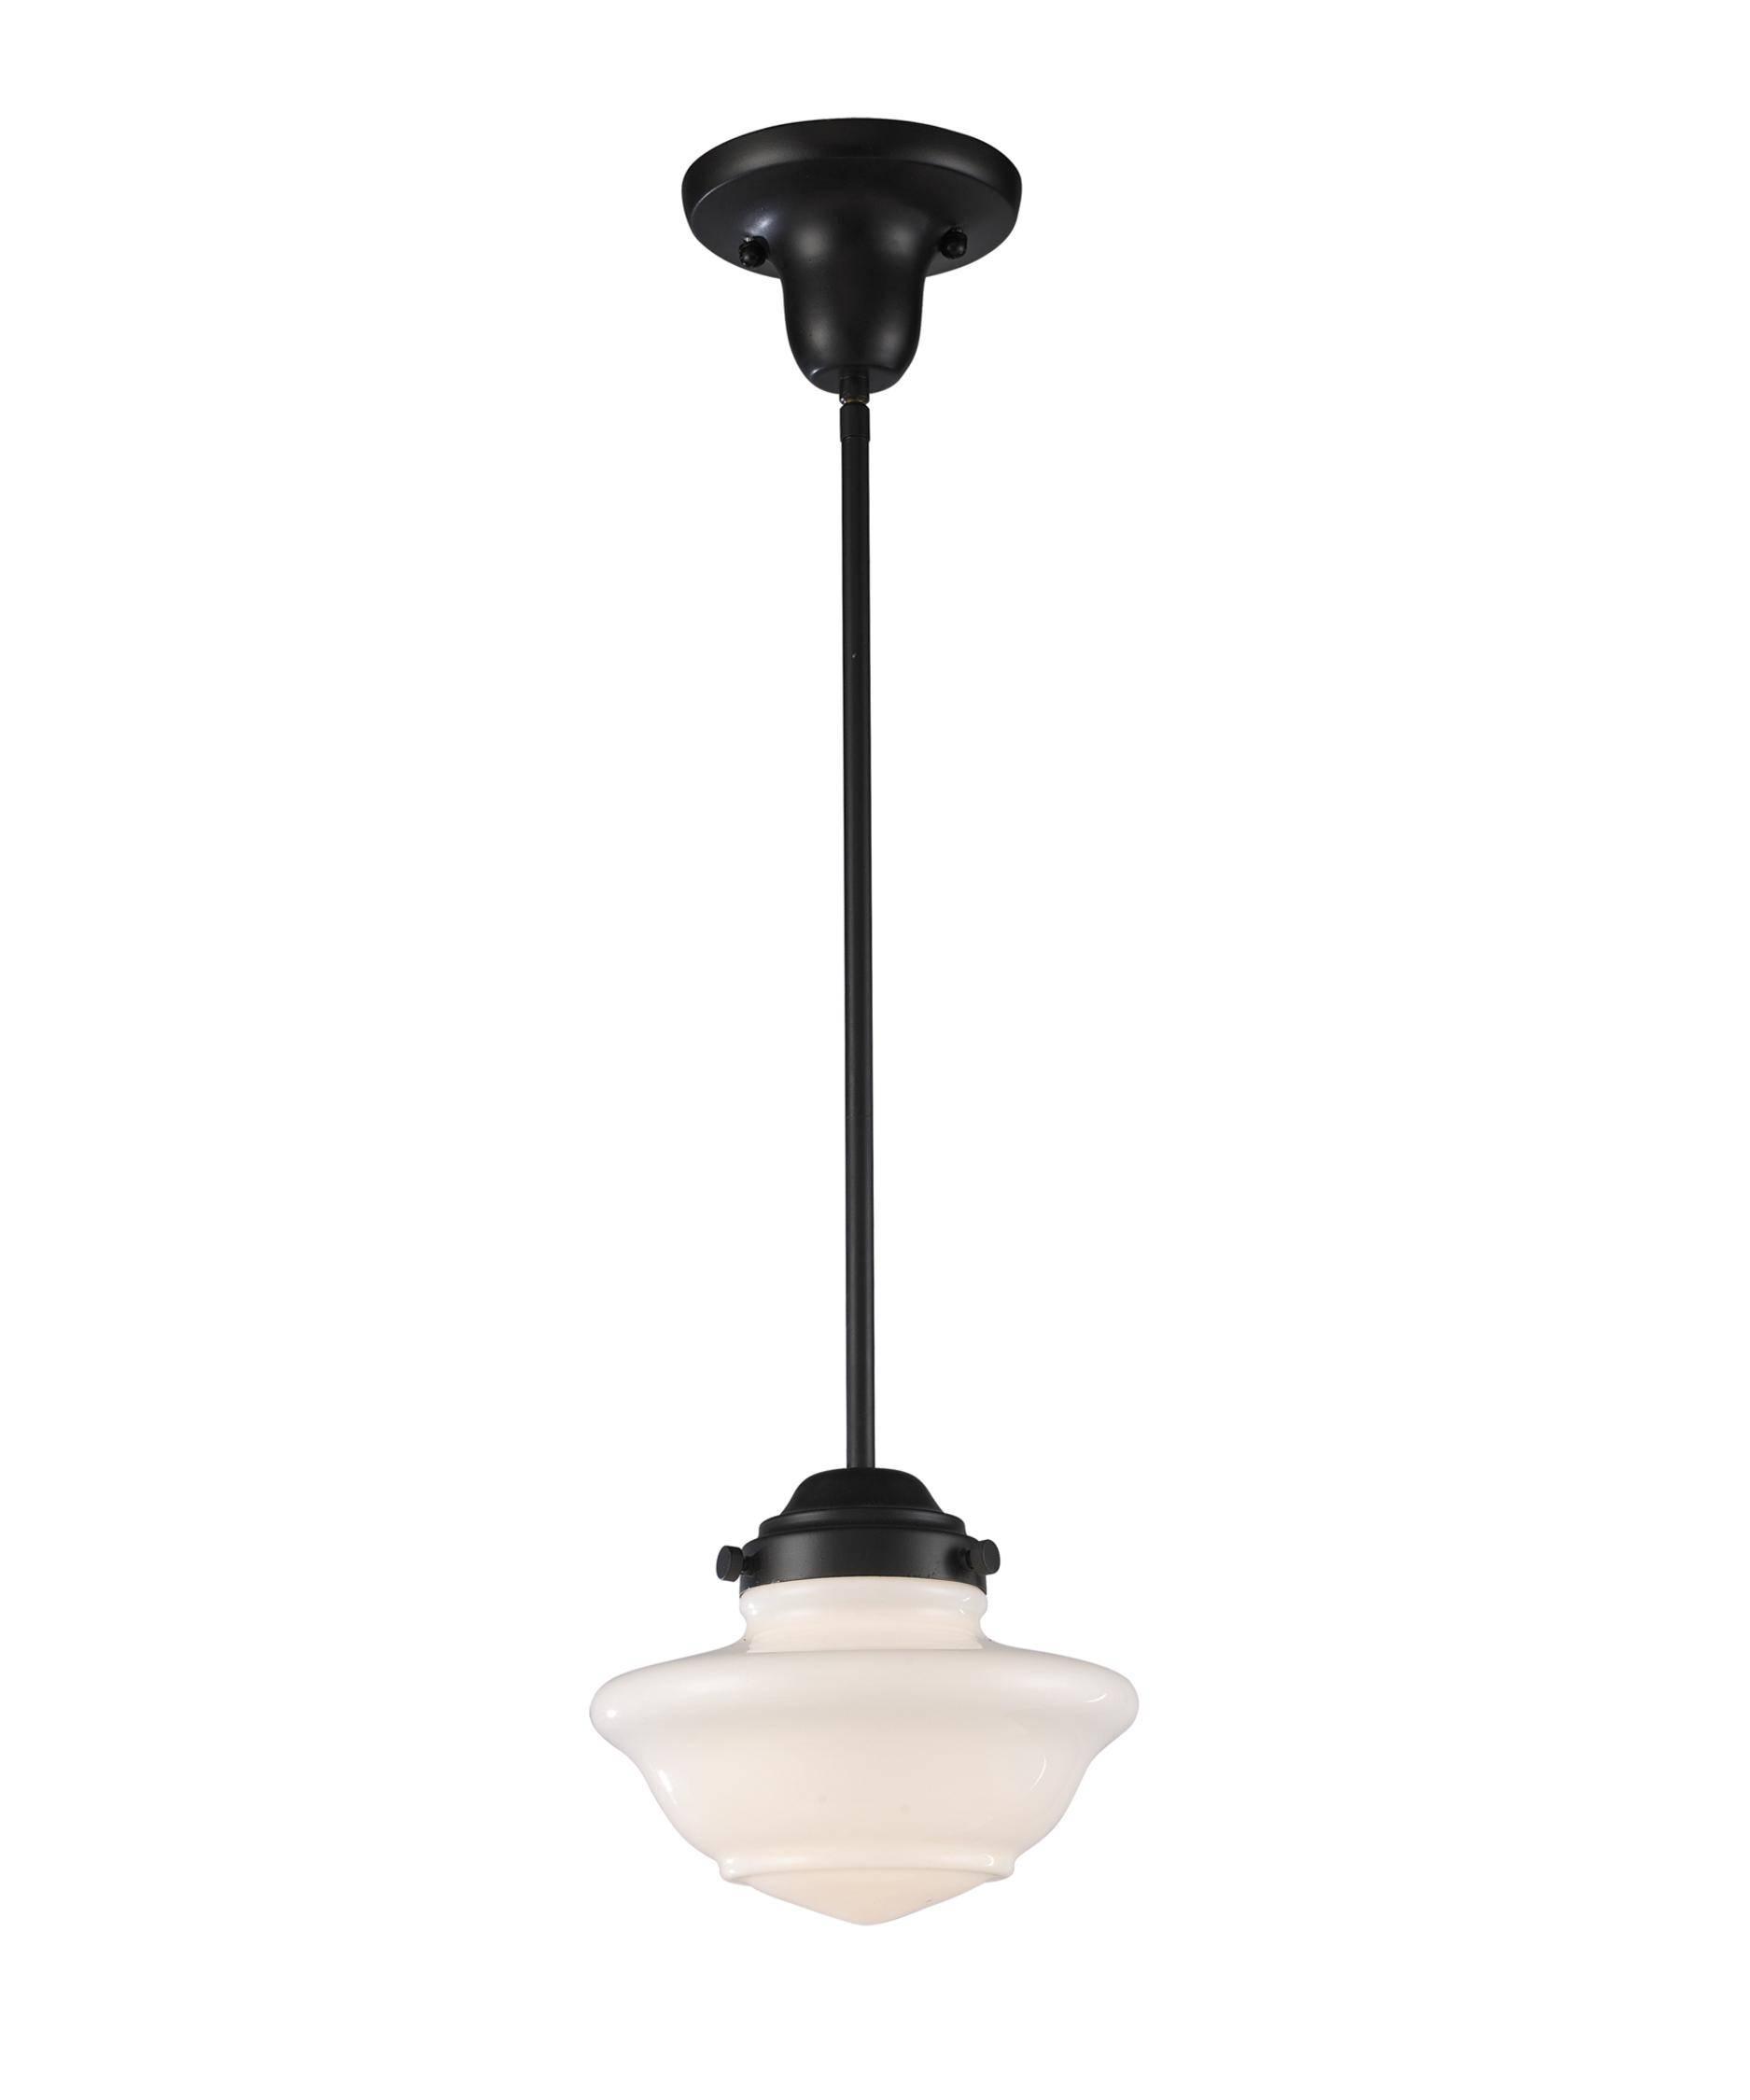 Elk Lighting 69052 1 Schoolhouse 8 Inch Wide 1 Light Mini Pendant Pertaining To Schoolhouse Pendant Lighting (View 11 of 15)